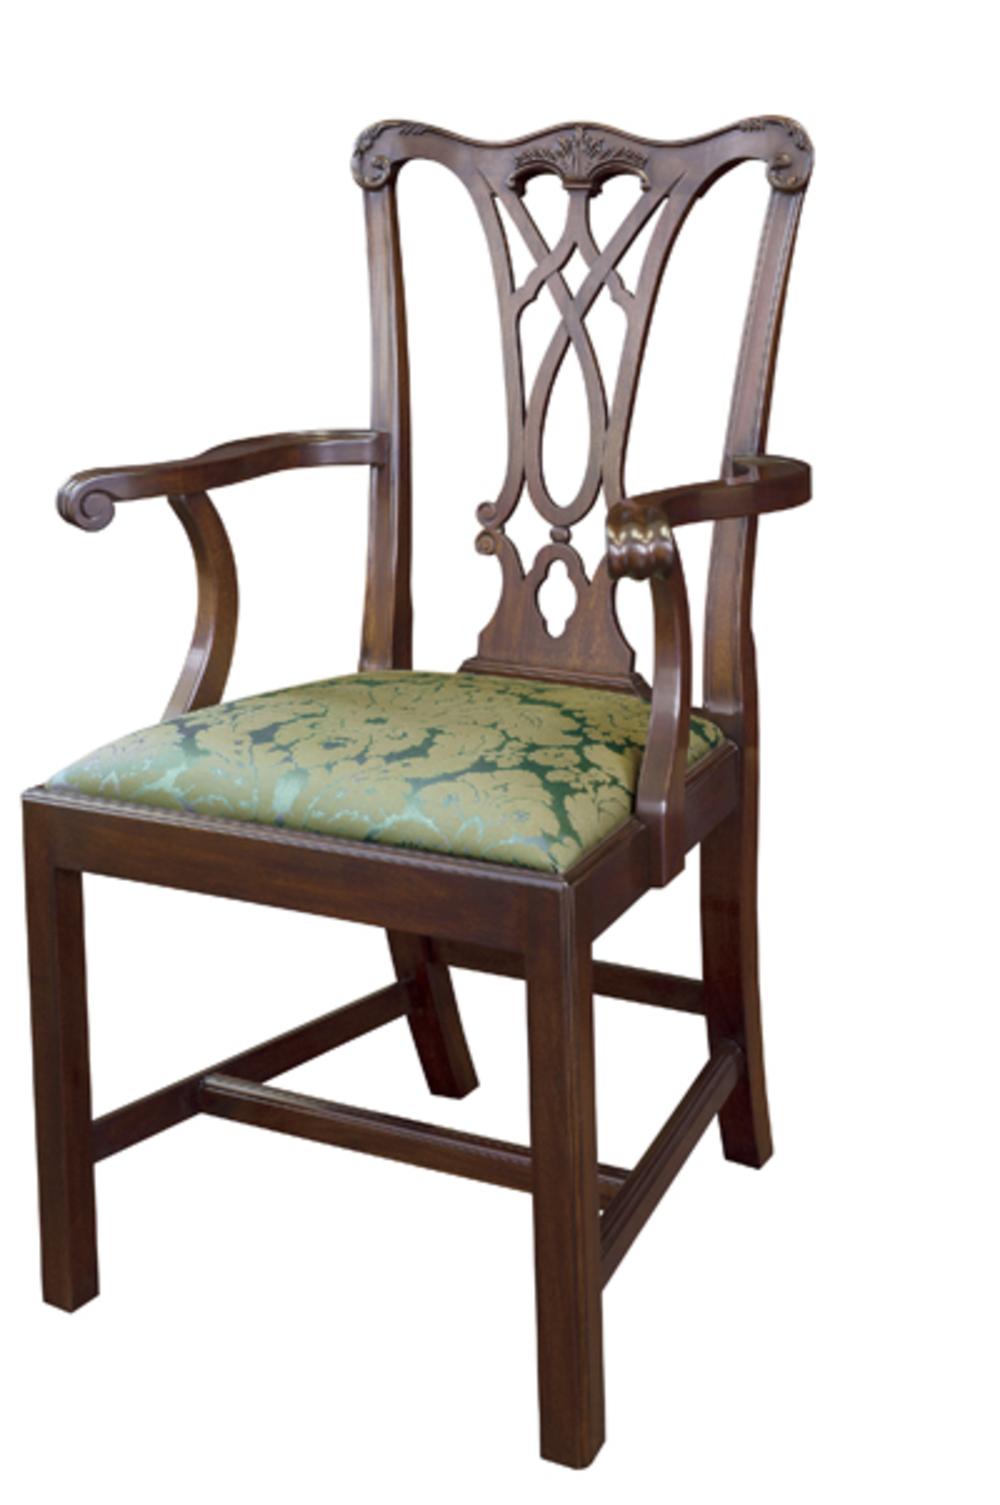 HENKEL-HARRIS, INC - Chippendale Arm Chair